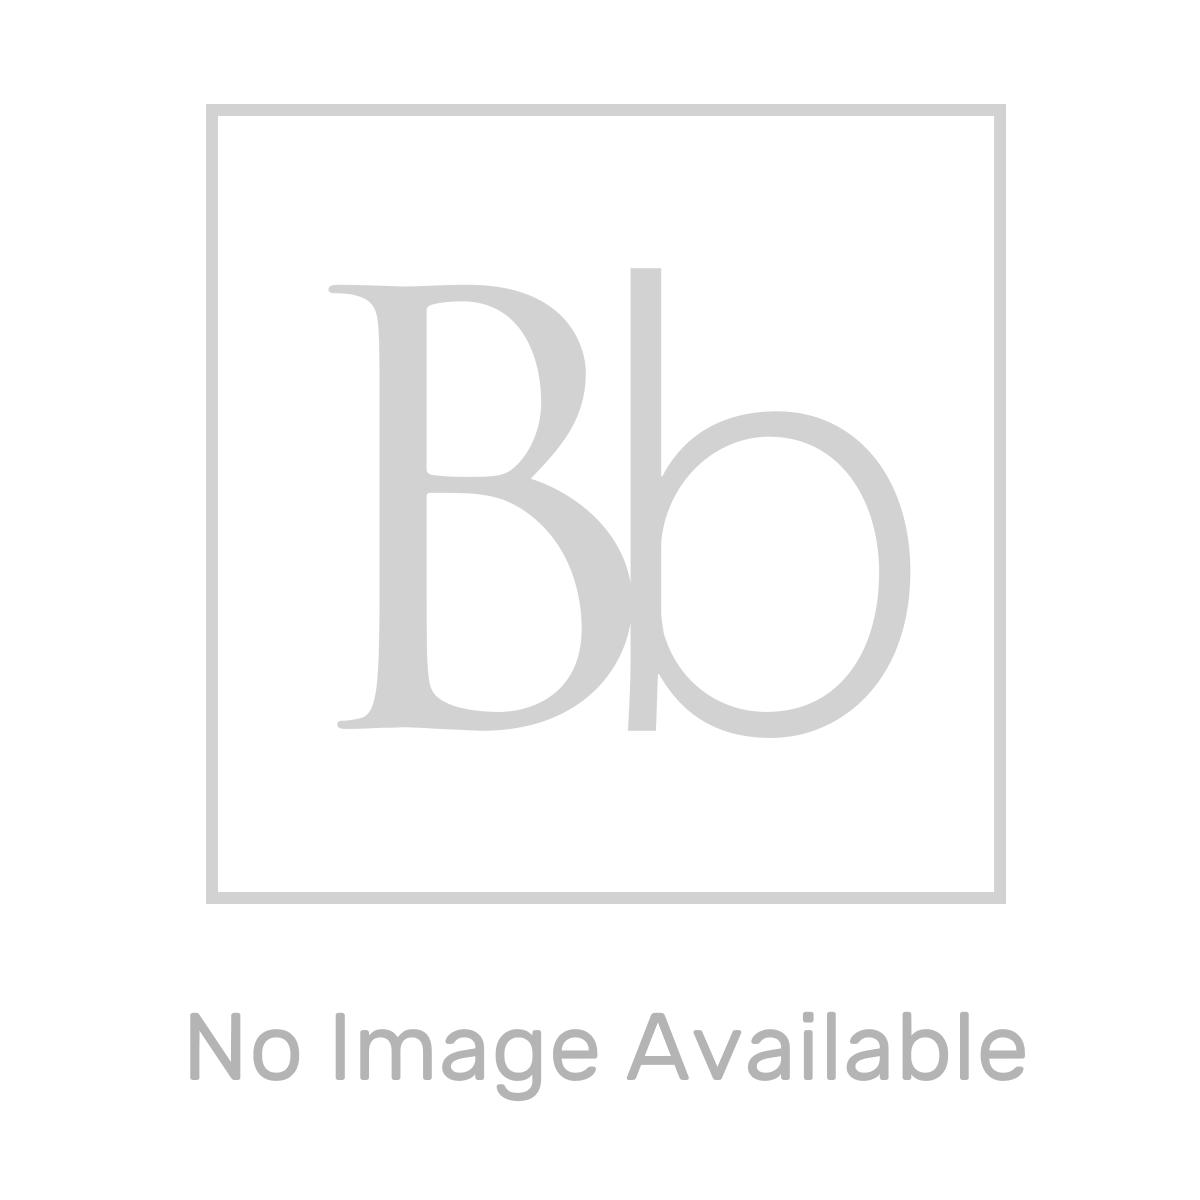 Hudson Reed Quartet Grey Gloss 3 Door Mirror Cabinet 1350mm